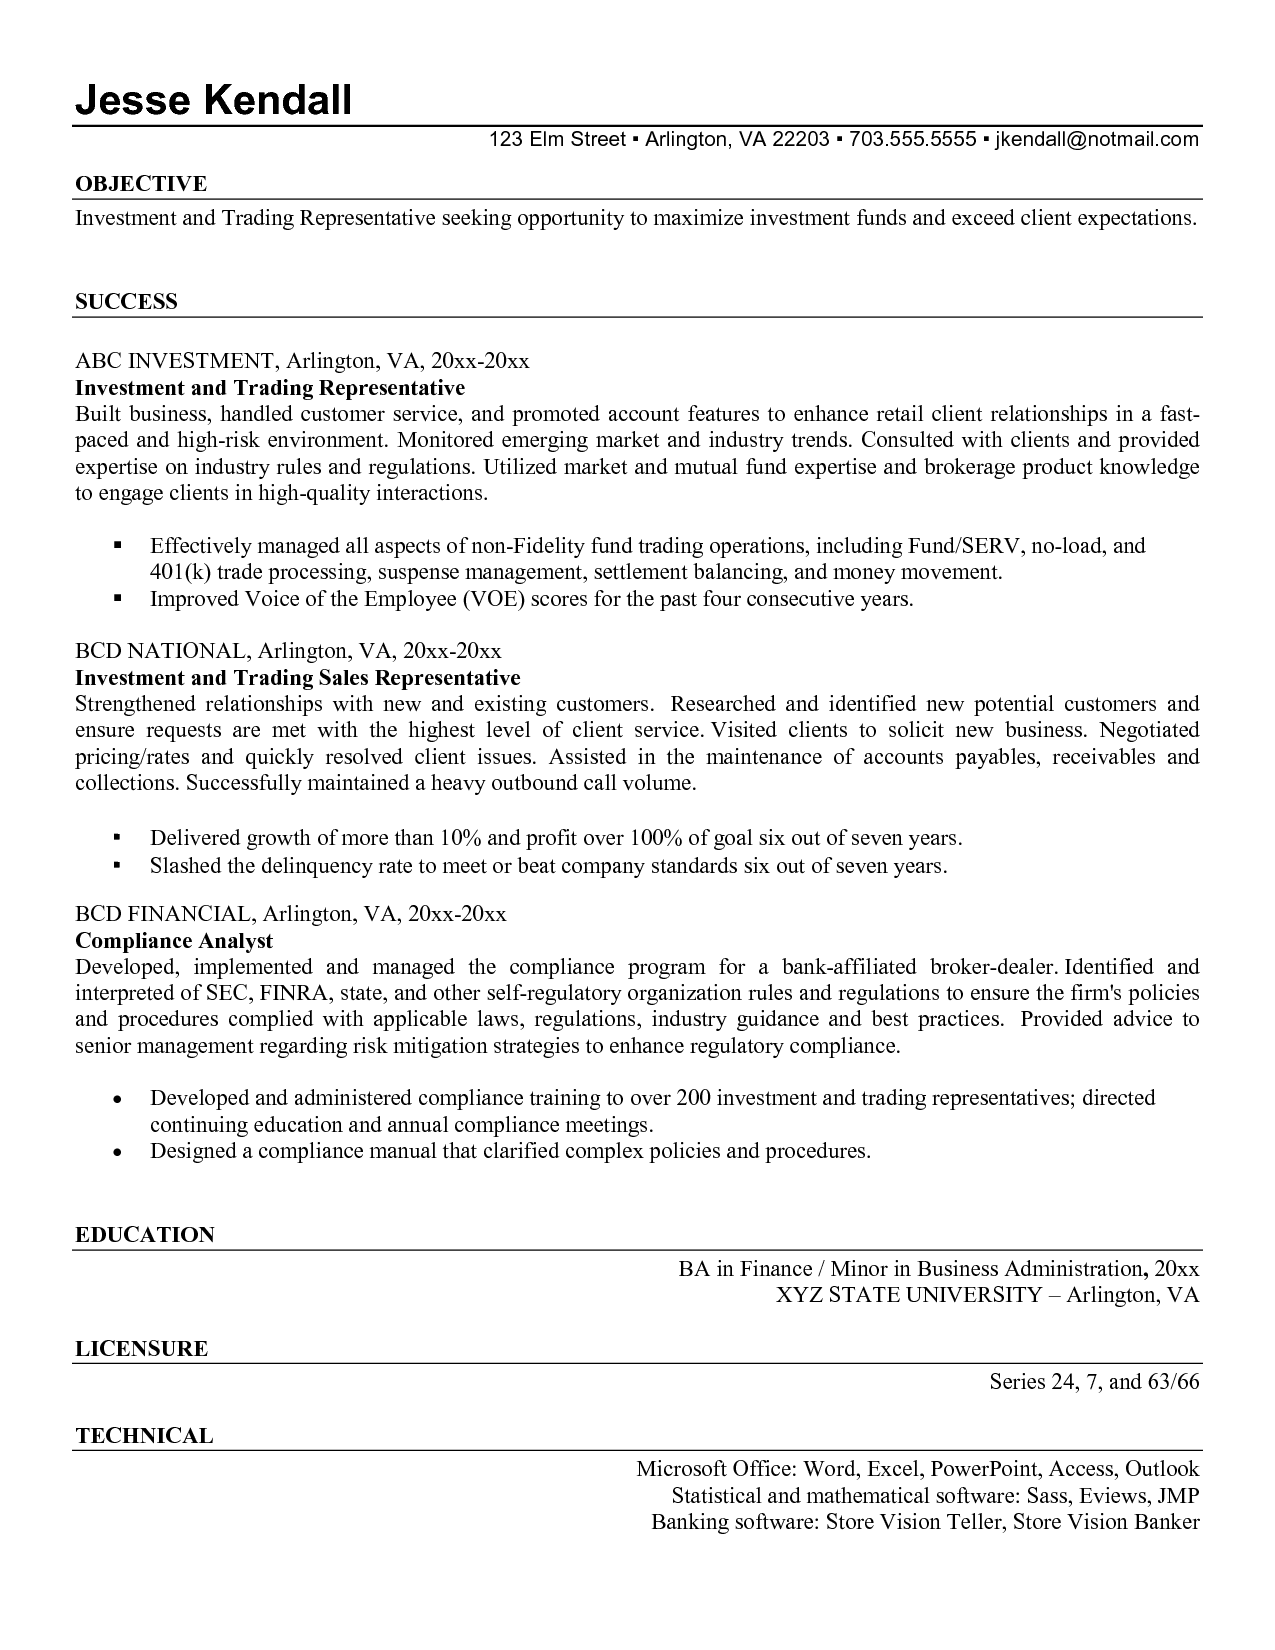 Proprietary Trading Resume Example http//www